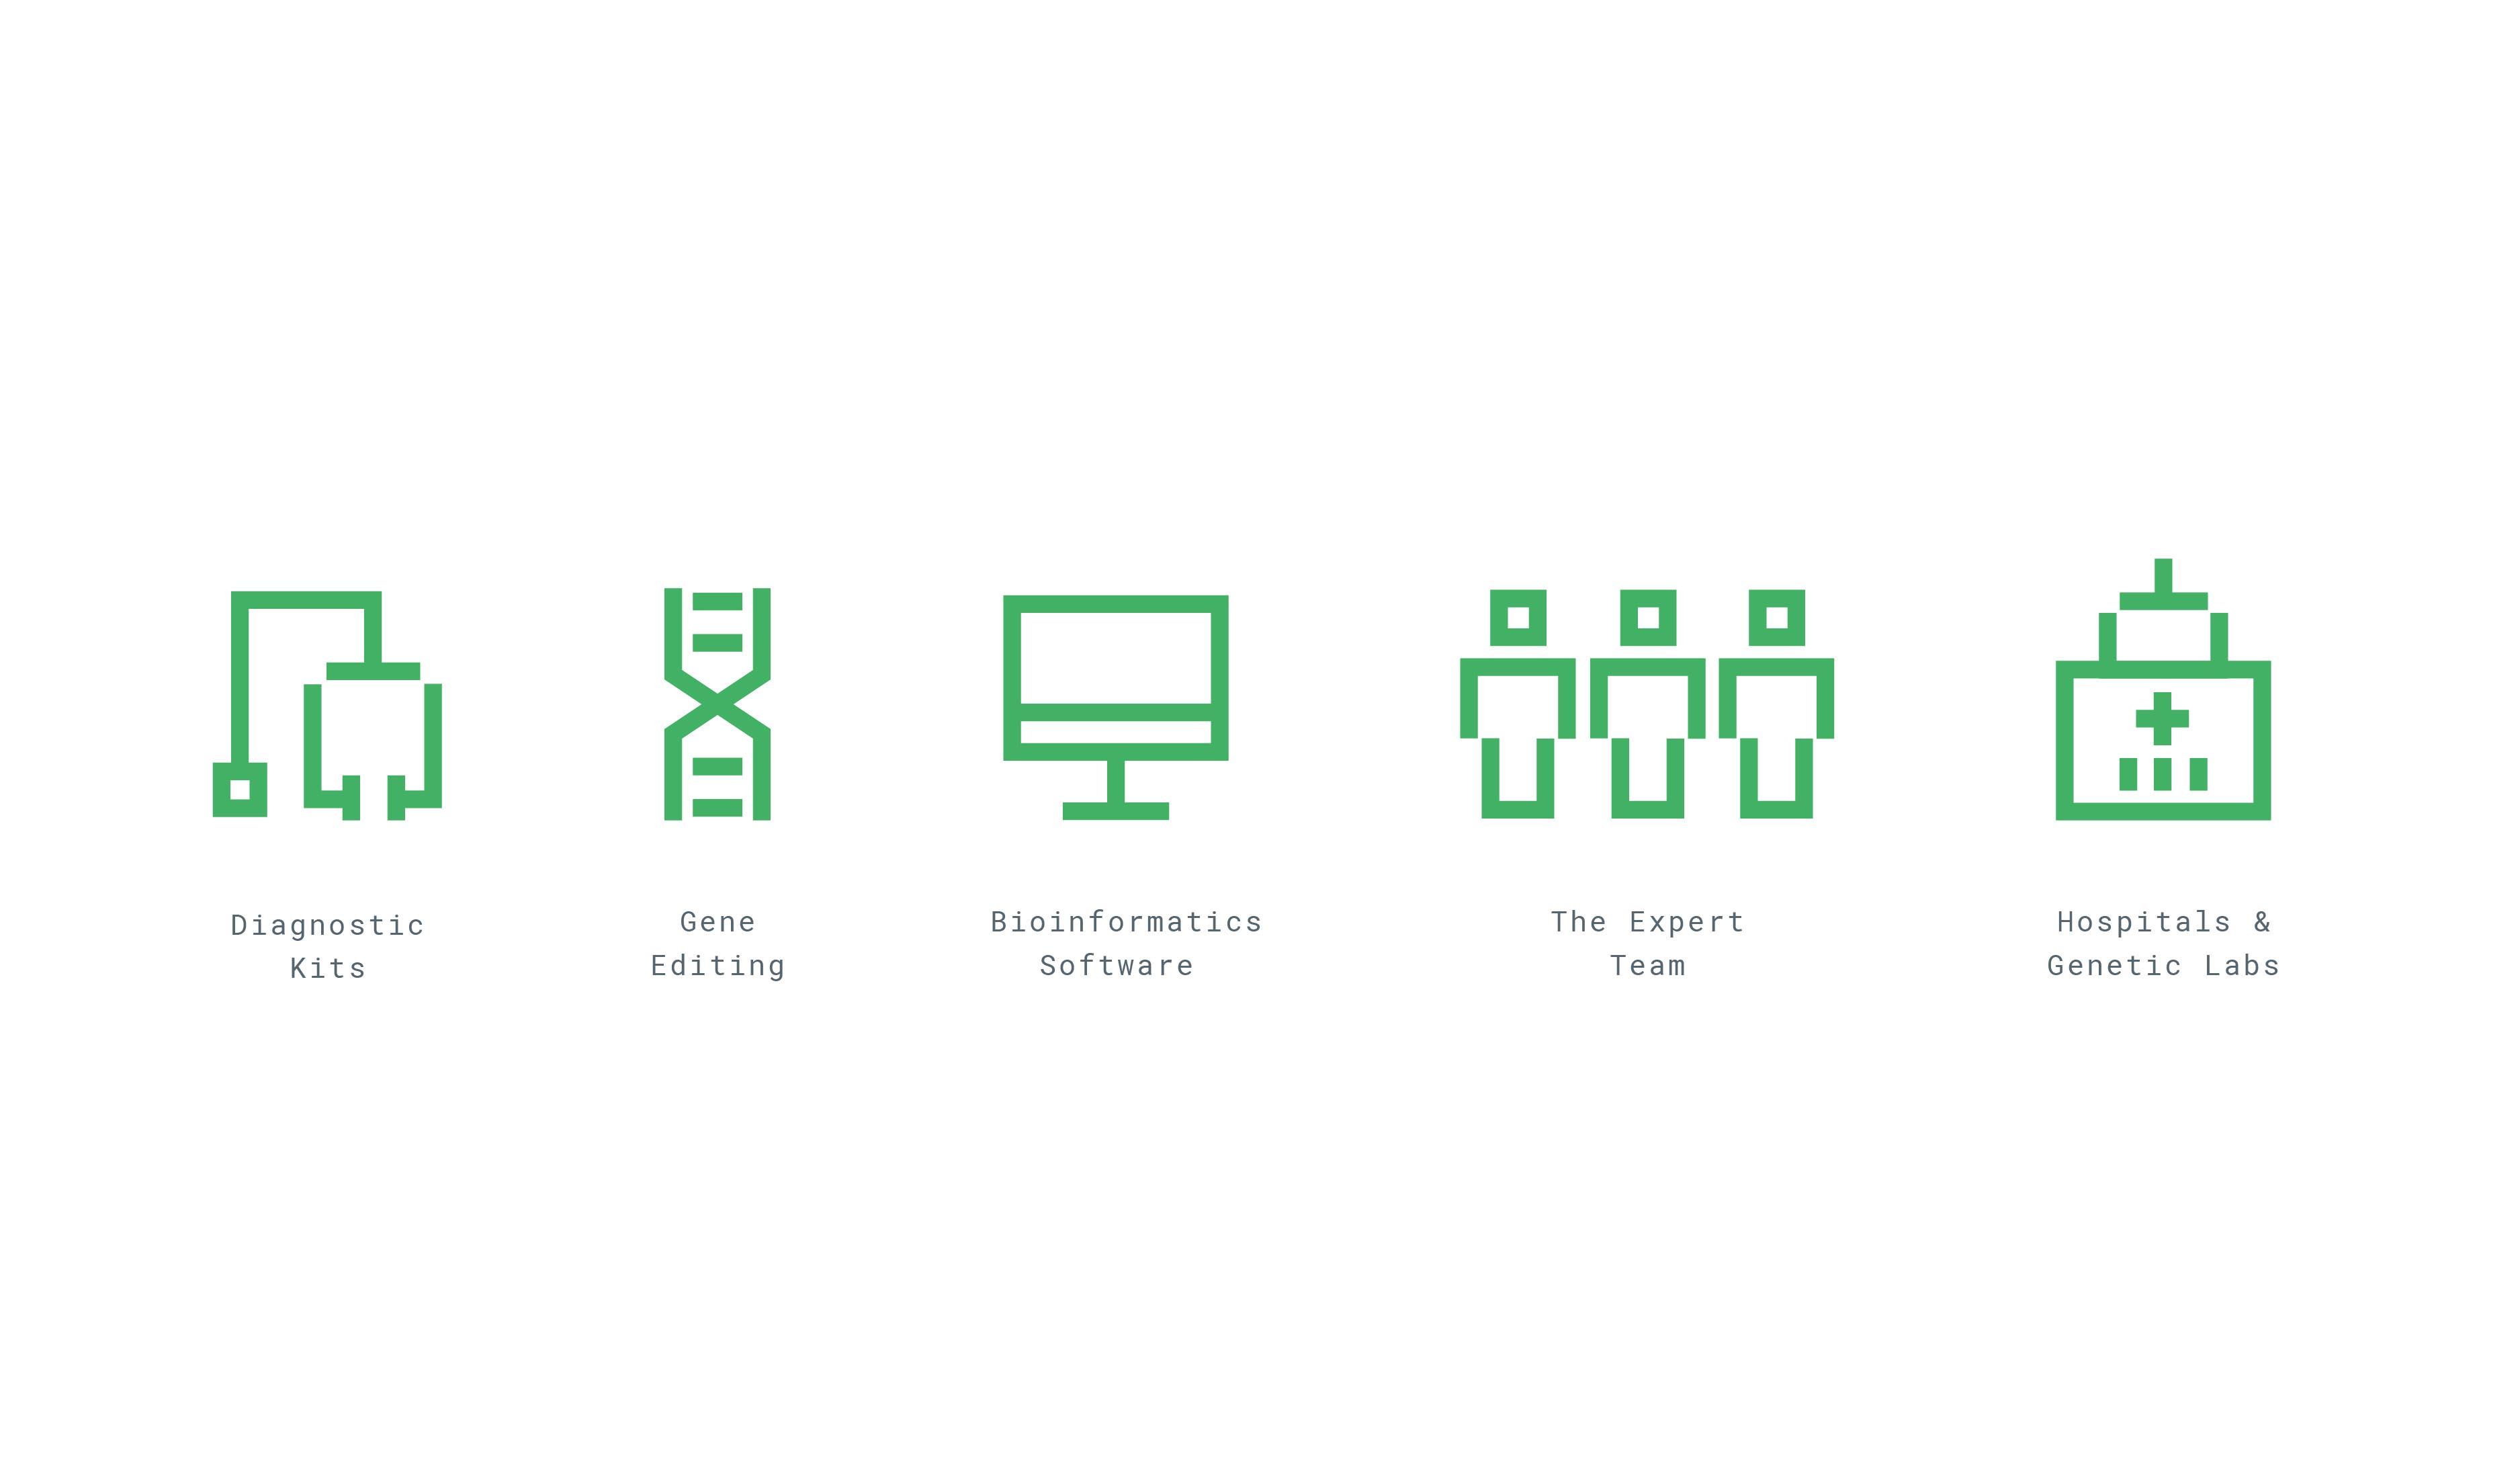 Applied Genomics brand identity icons